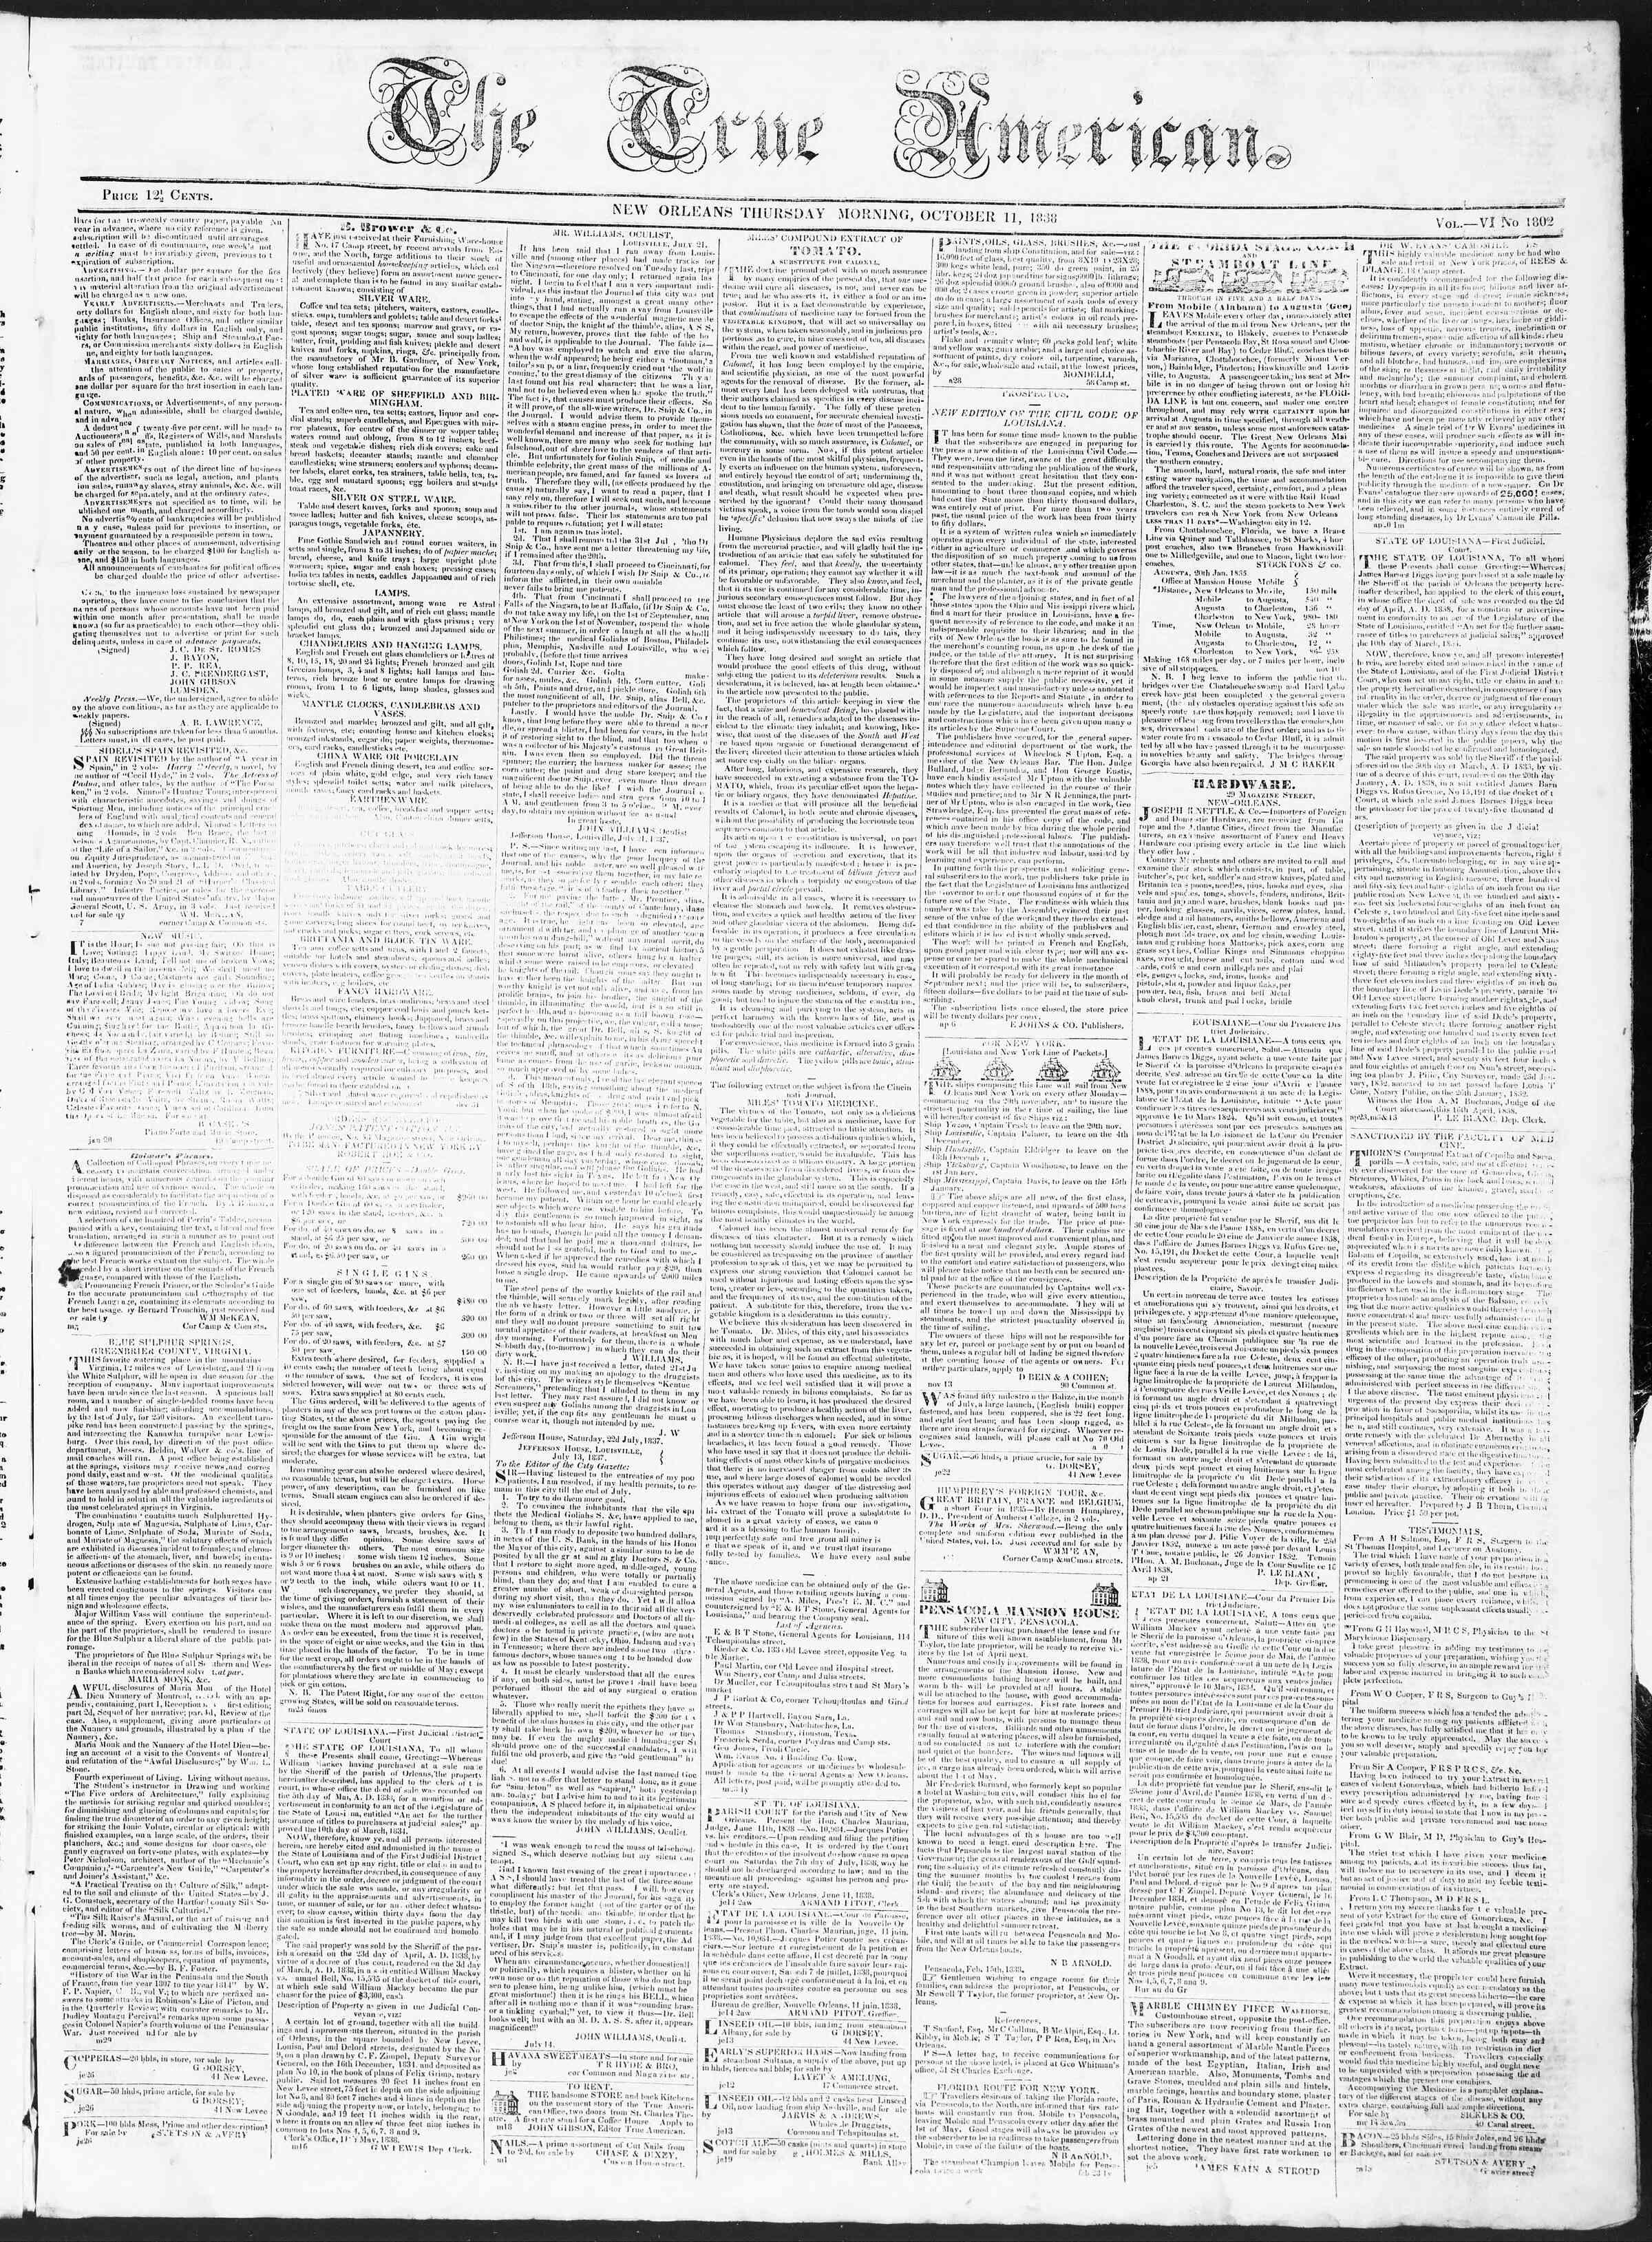 October 11, 1838 Tarihli True American Gazetesi Sayfa 1